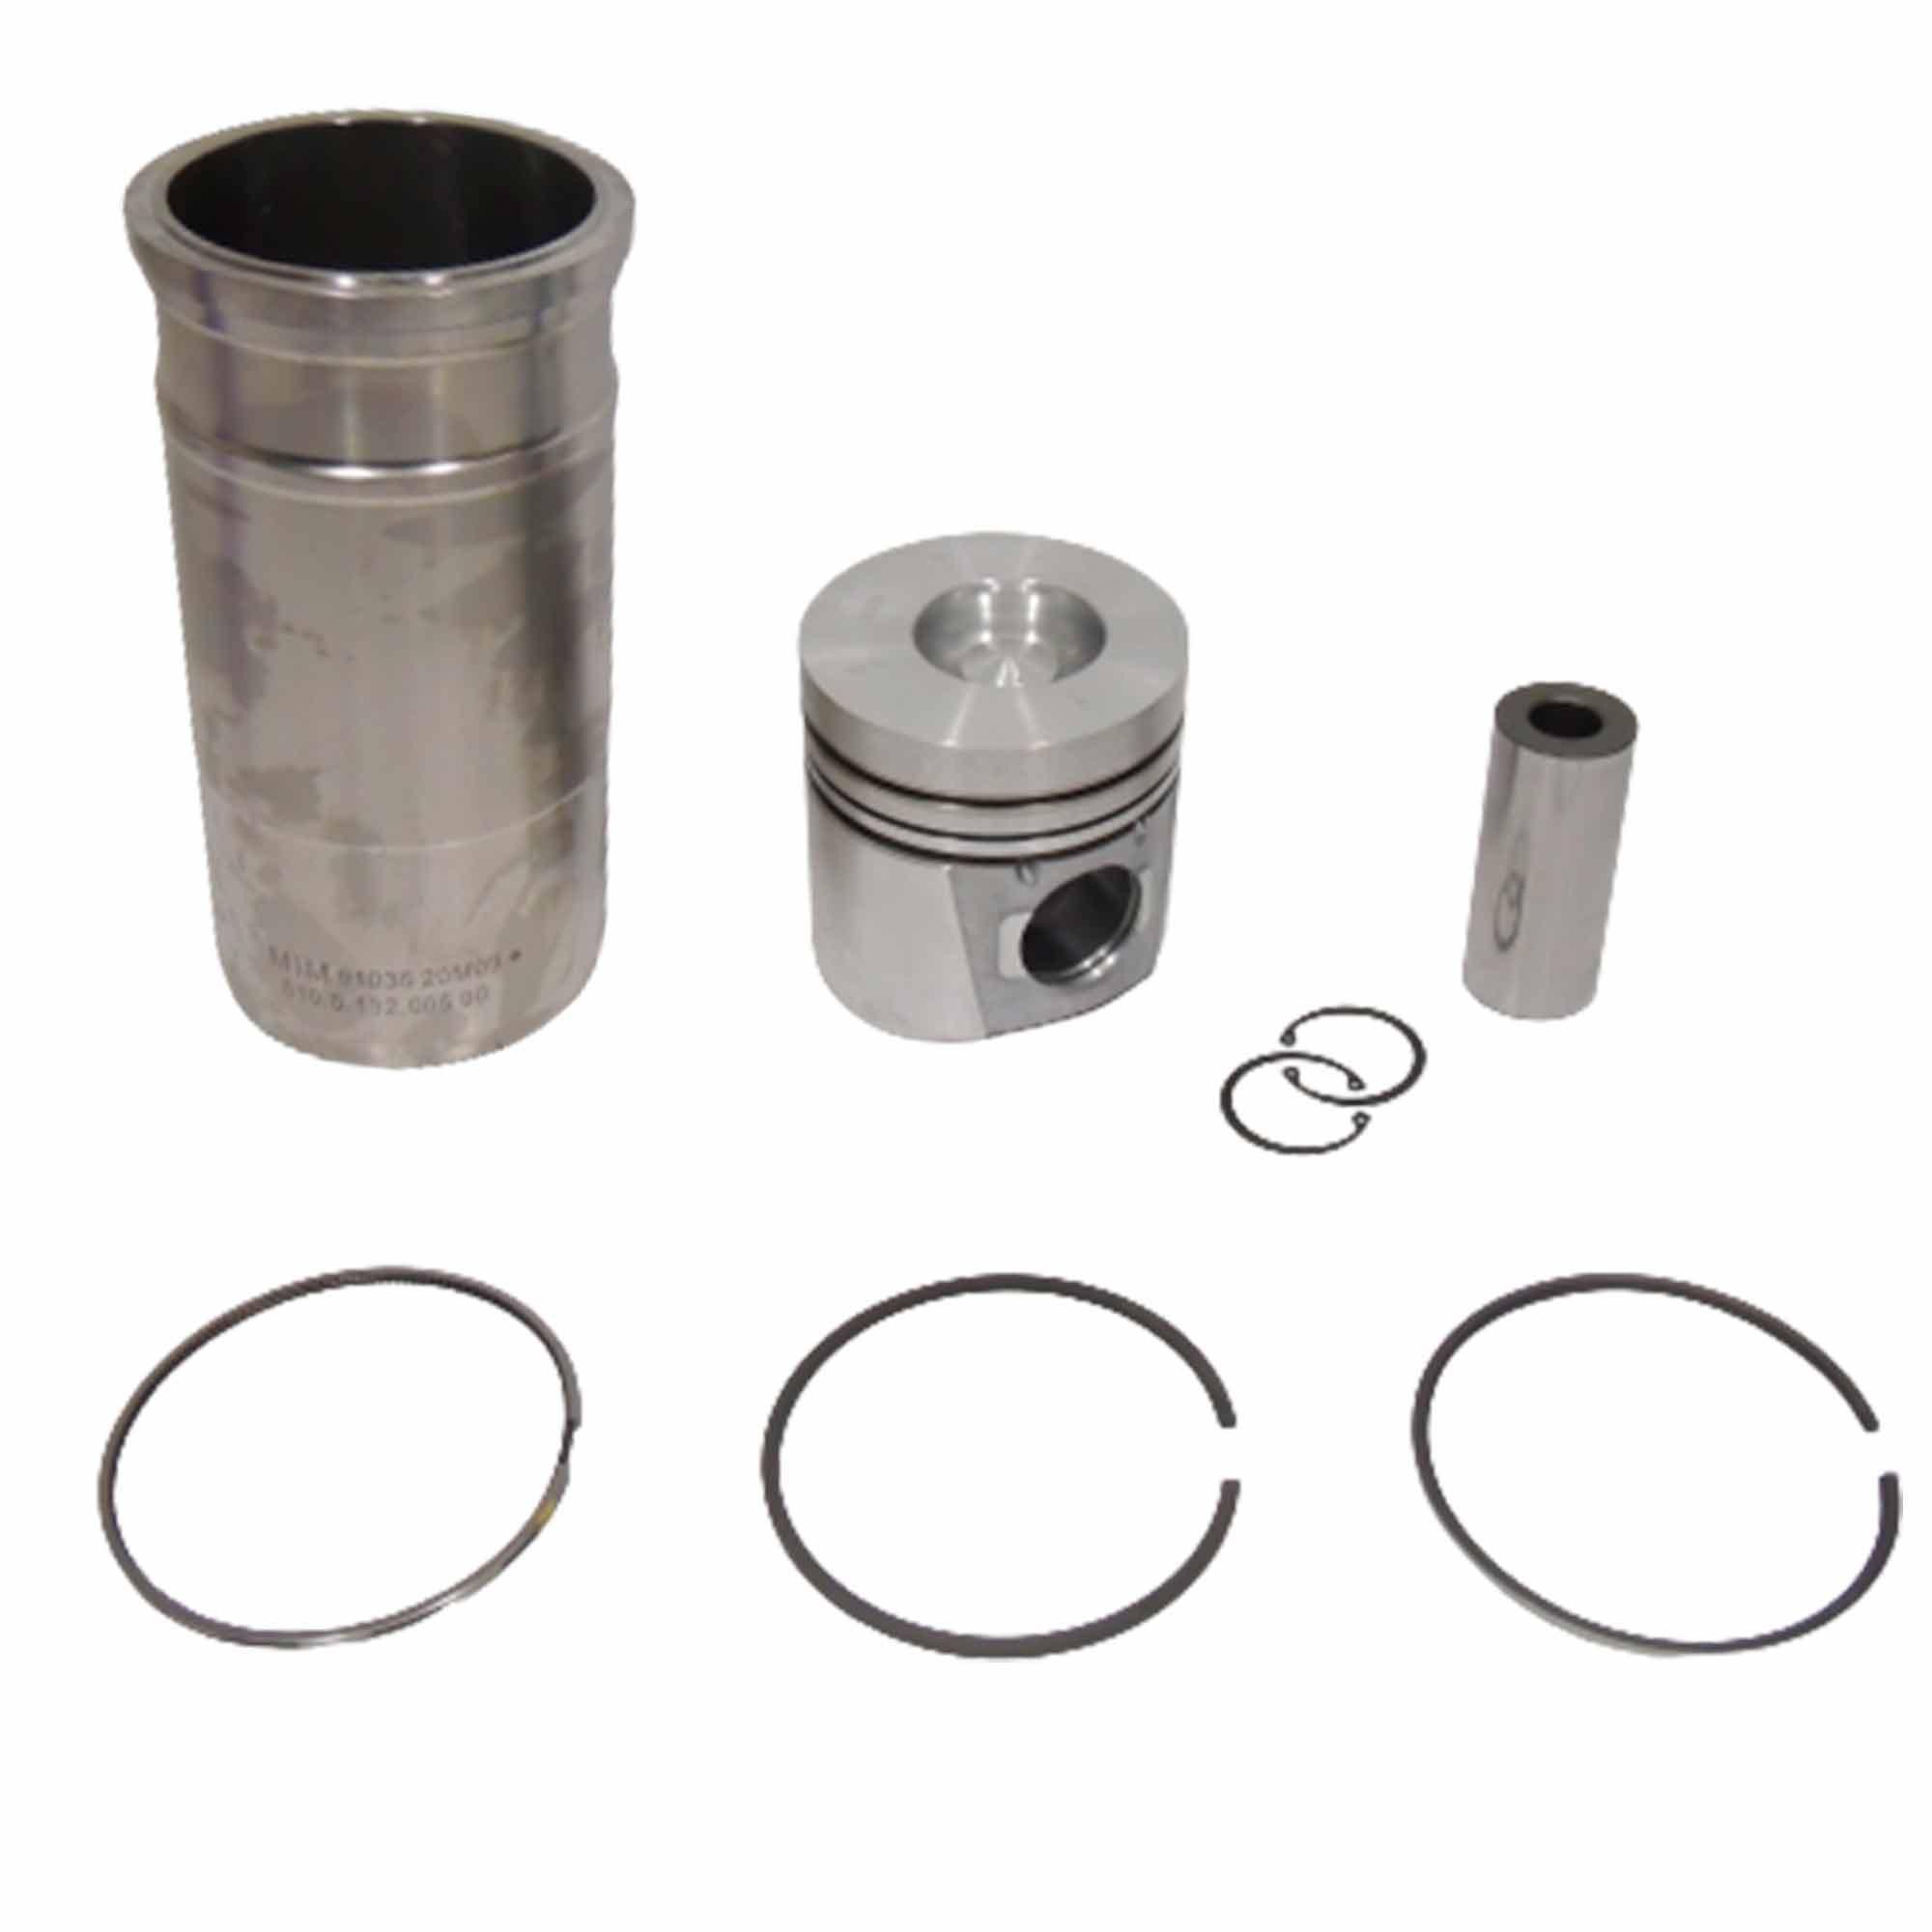 941080190048 - Kit de reparo para 1 cilindro